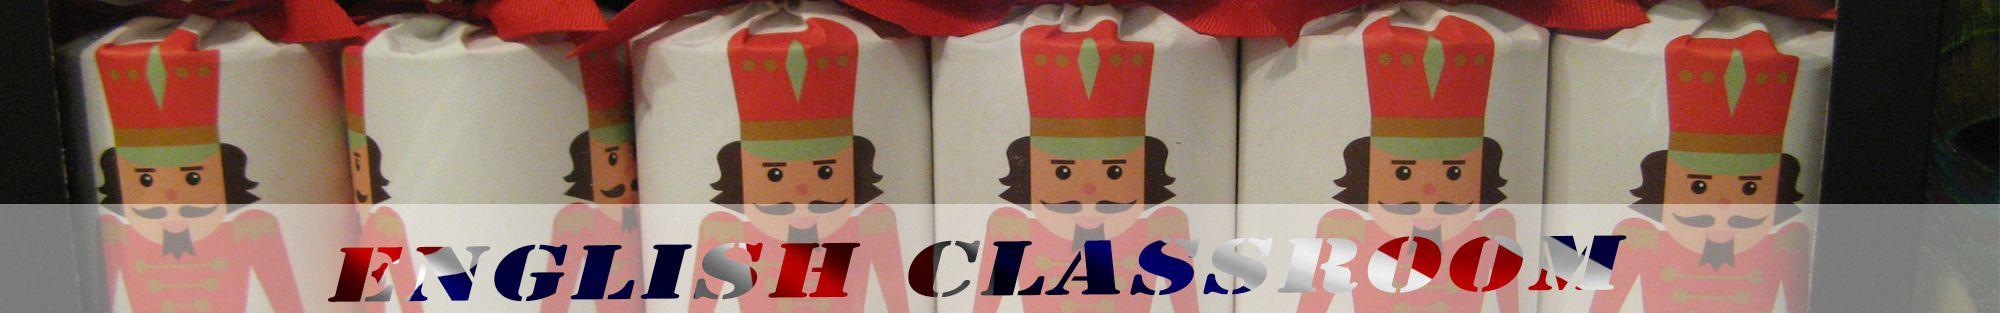 header christmas english classroom